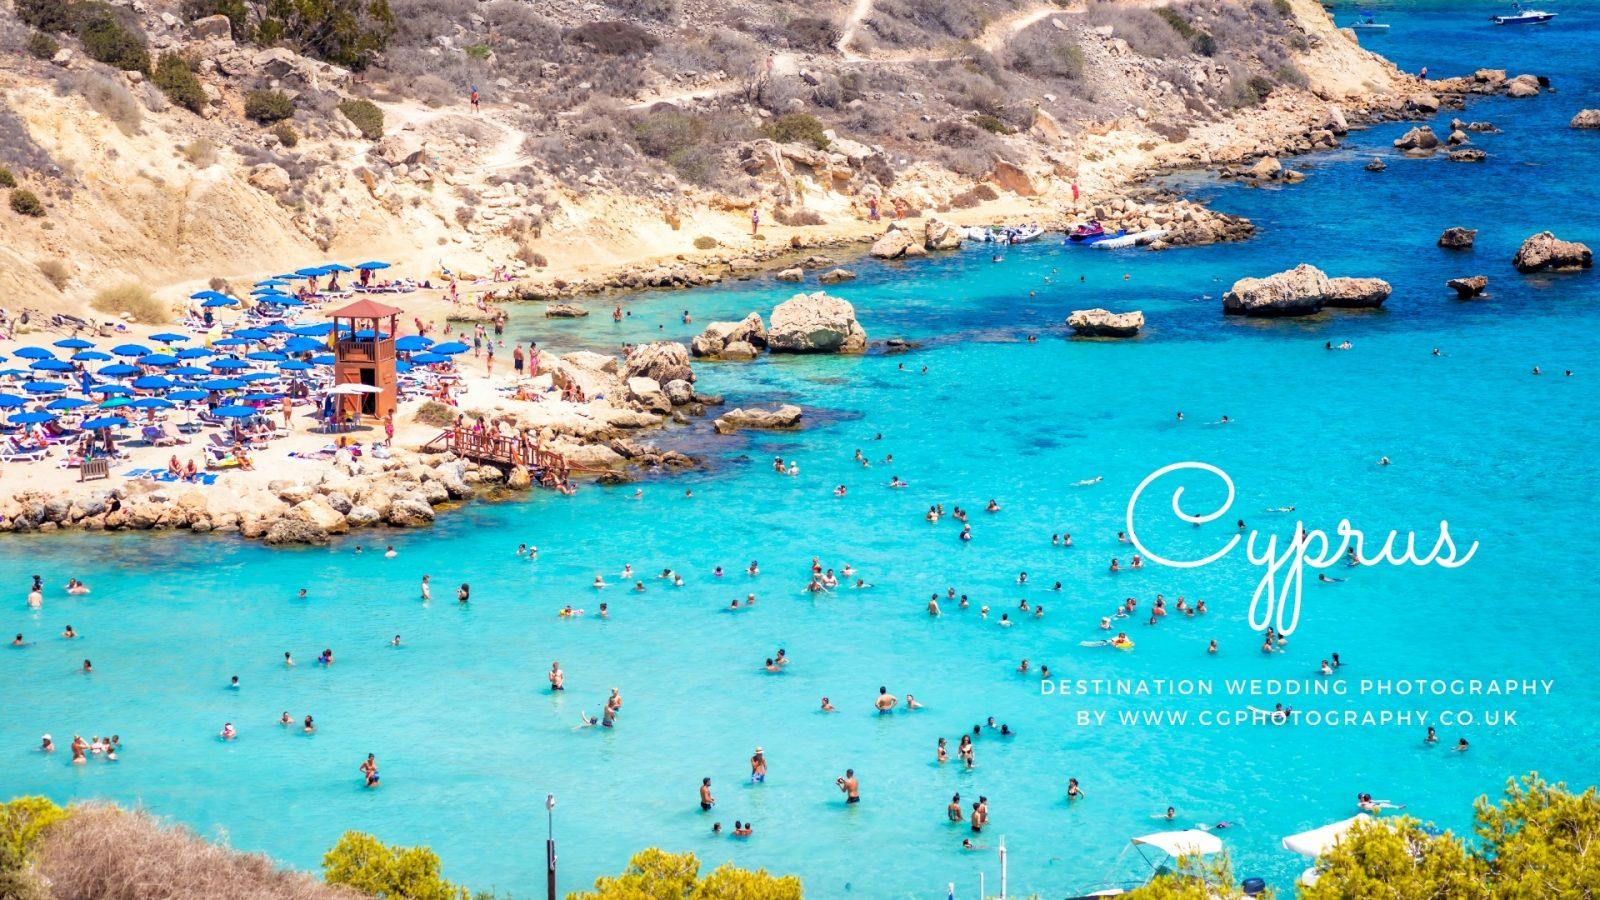 Destination Wedding Photographer Cyprus